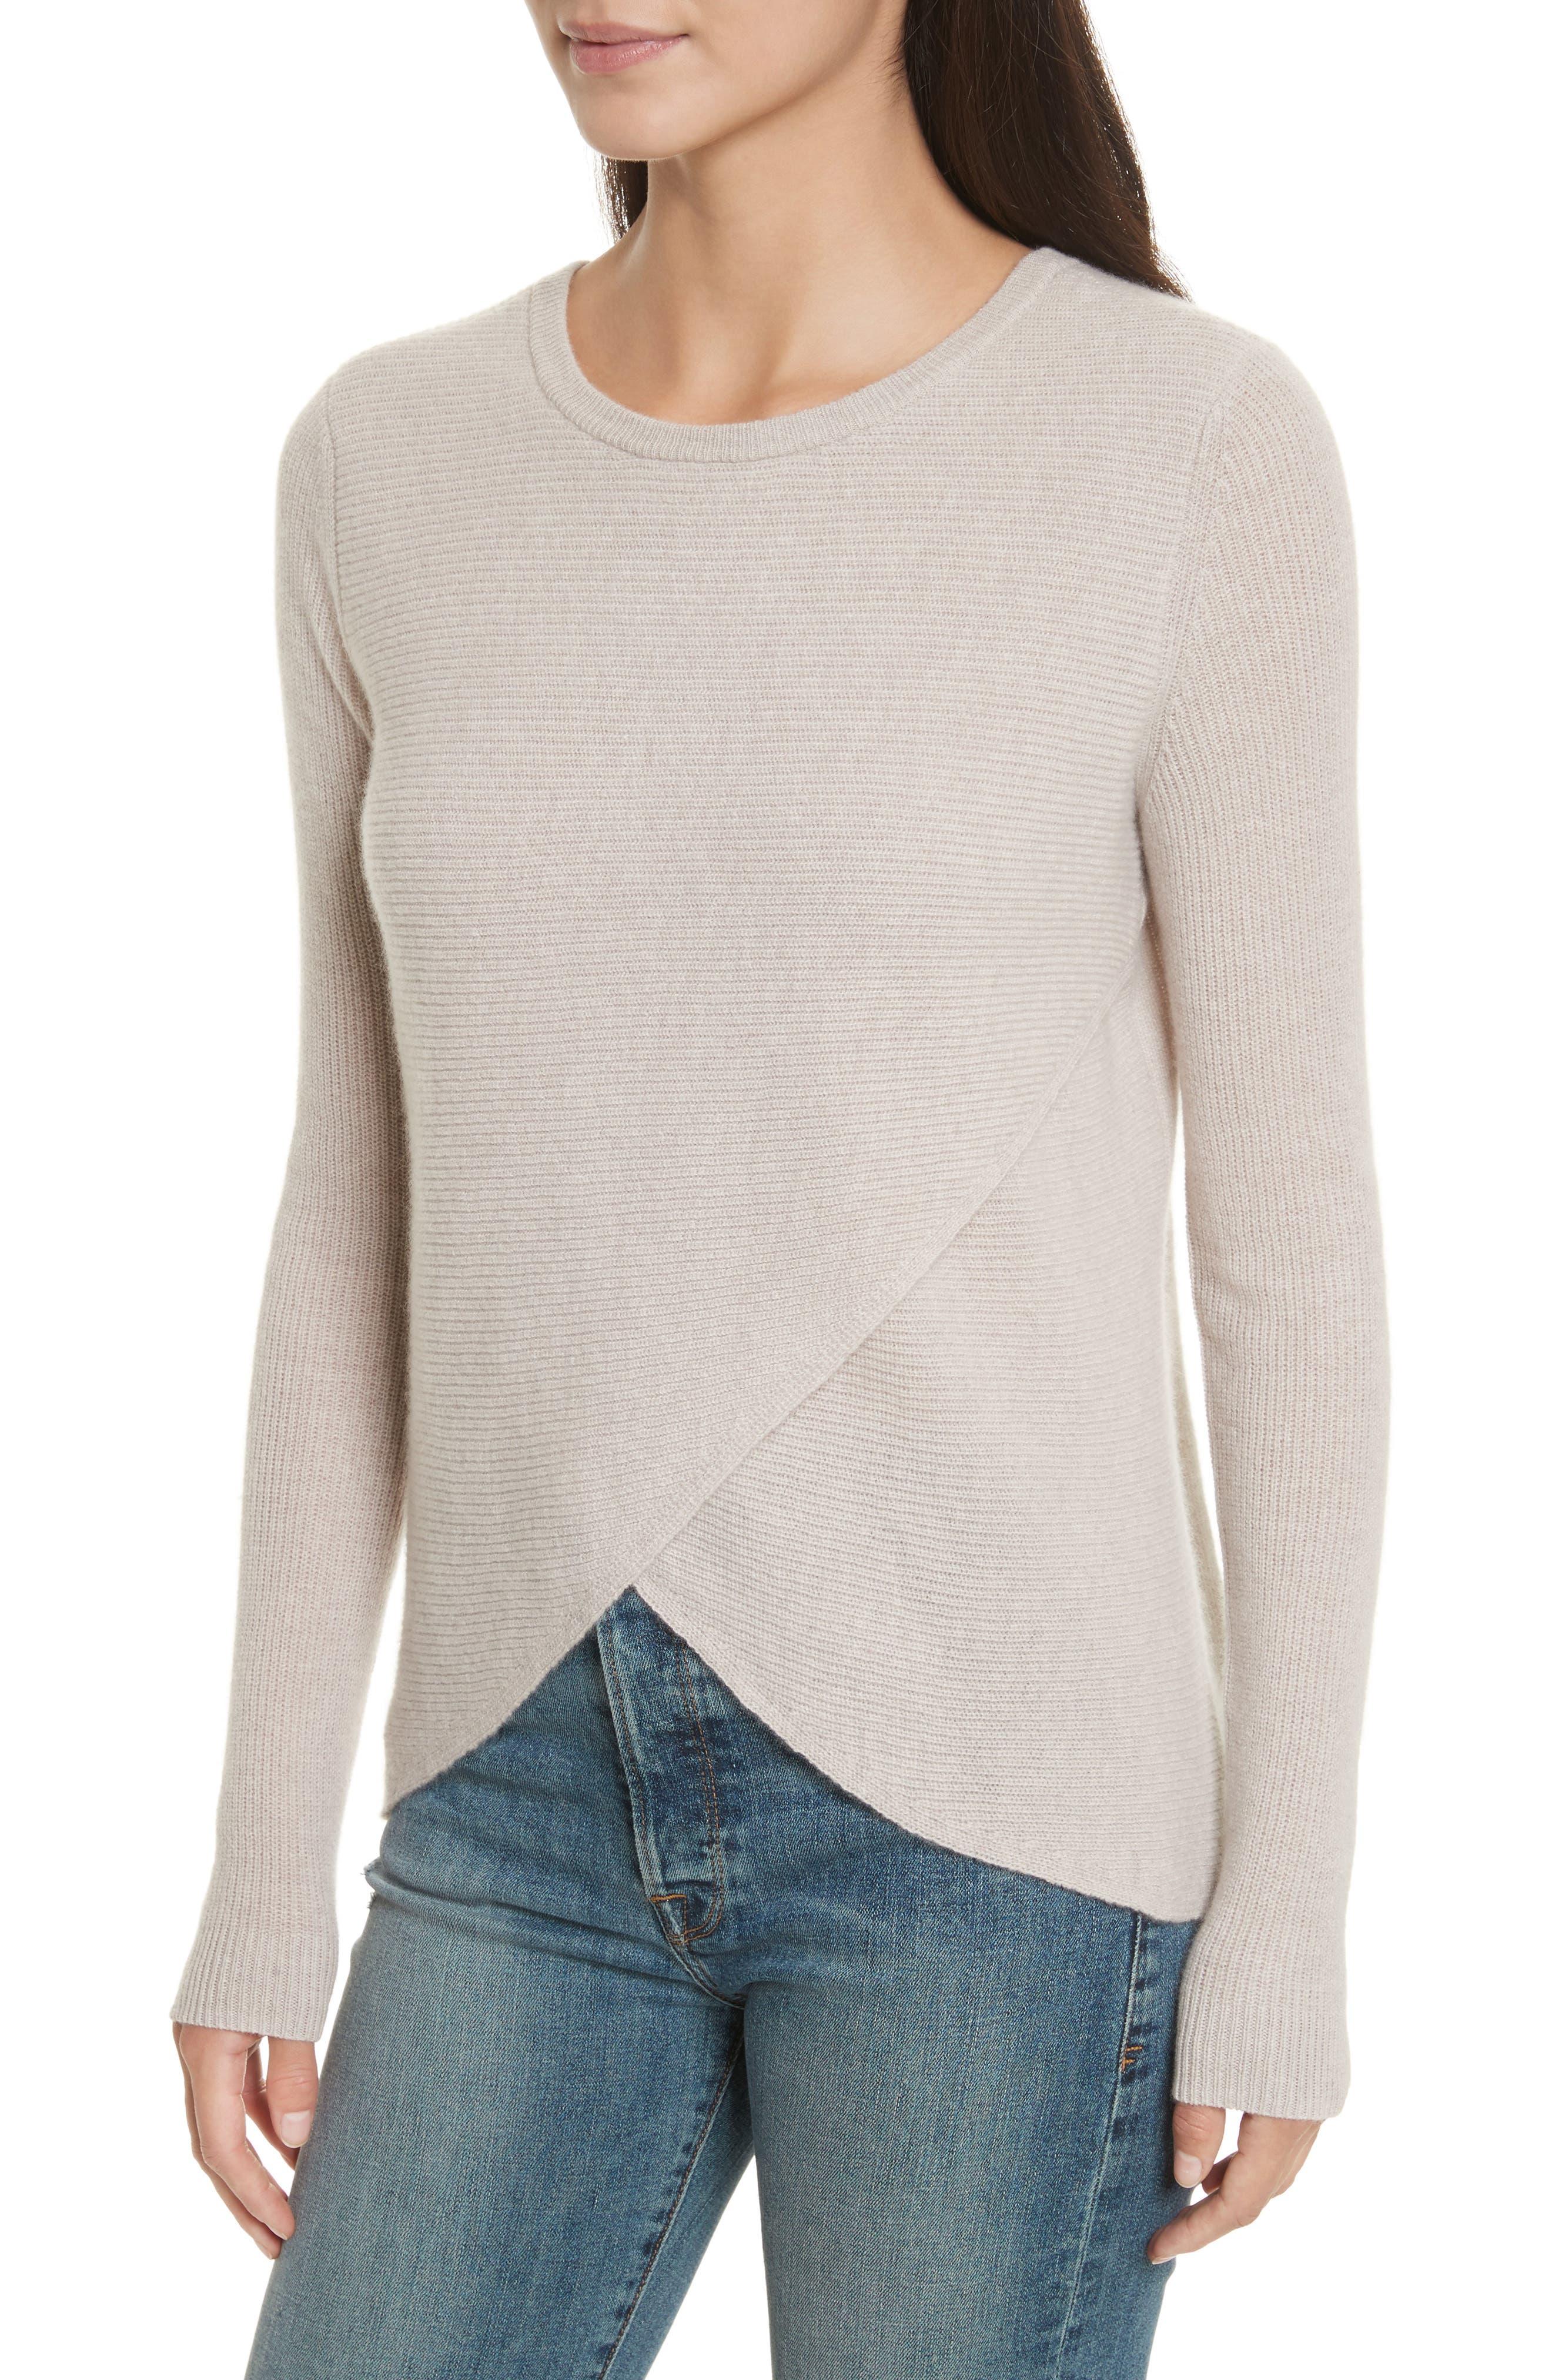 Main Image - autumn cashmere Cashmere Reversible Surplice Sweater